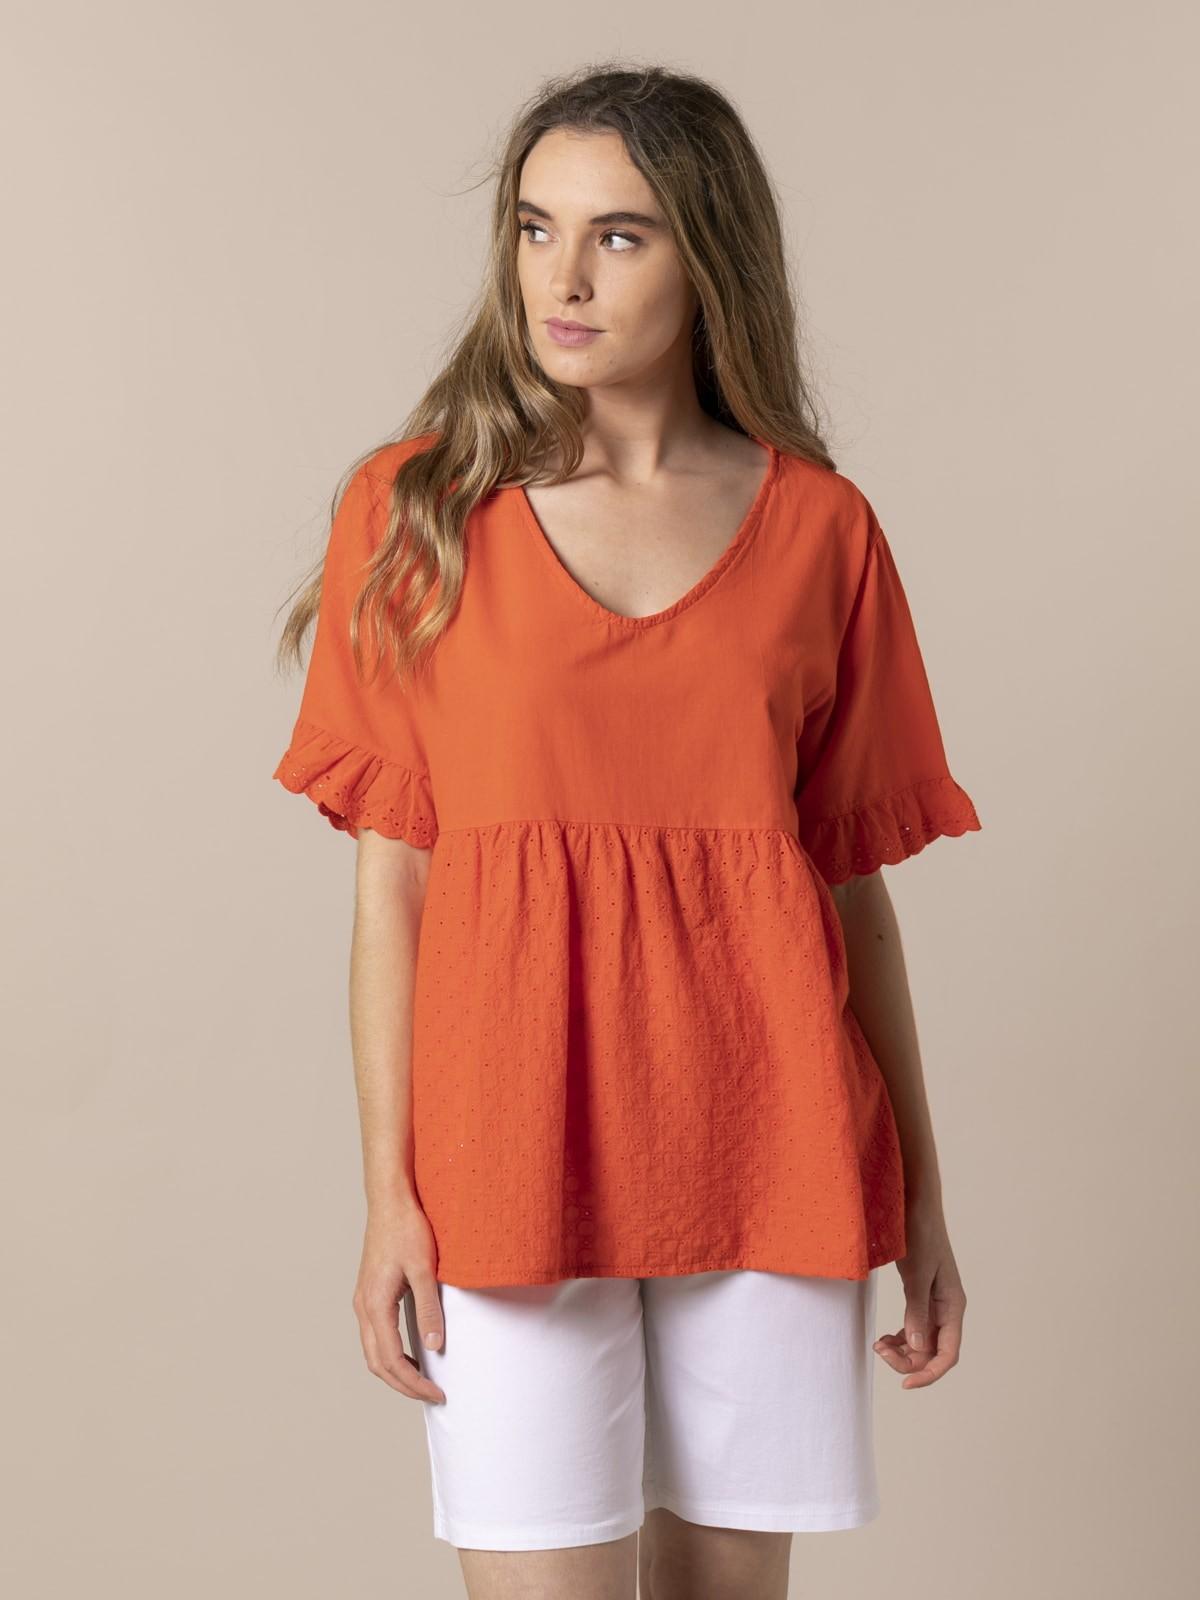 Blusa mujer algodón voile fresh Naranja